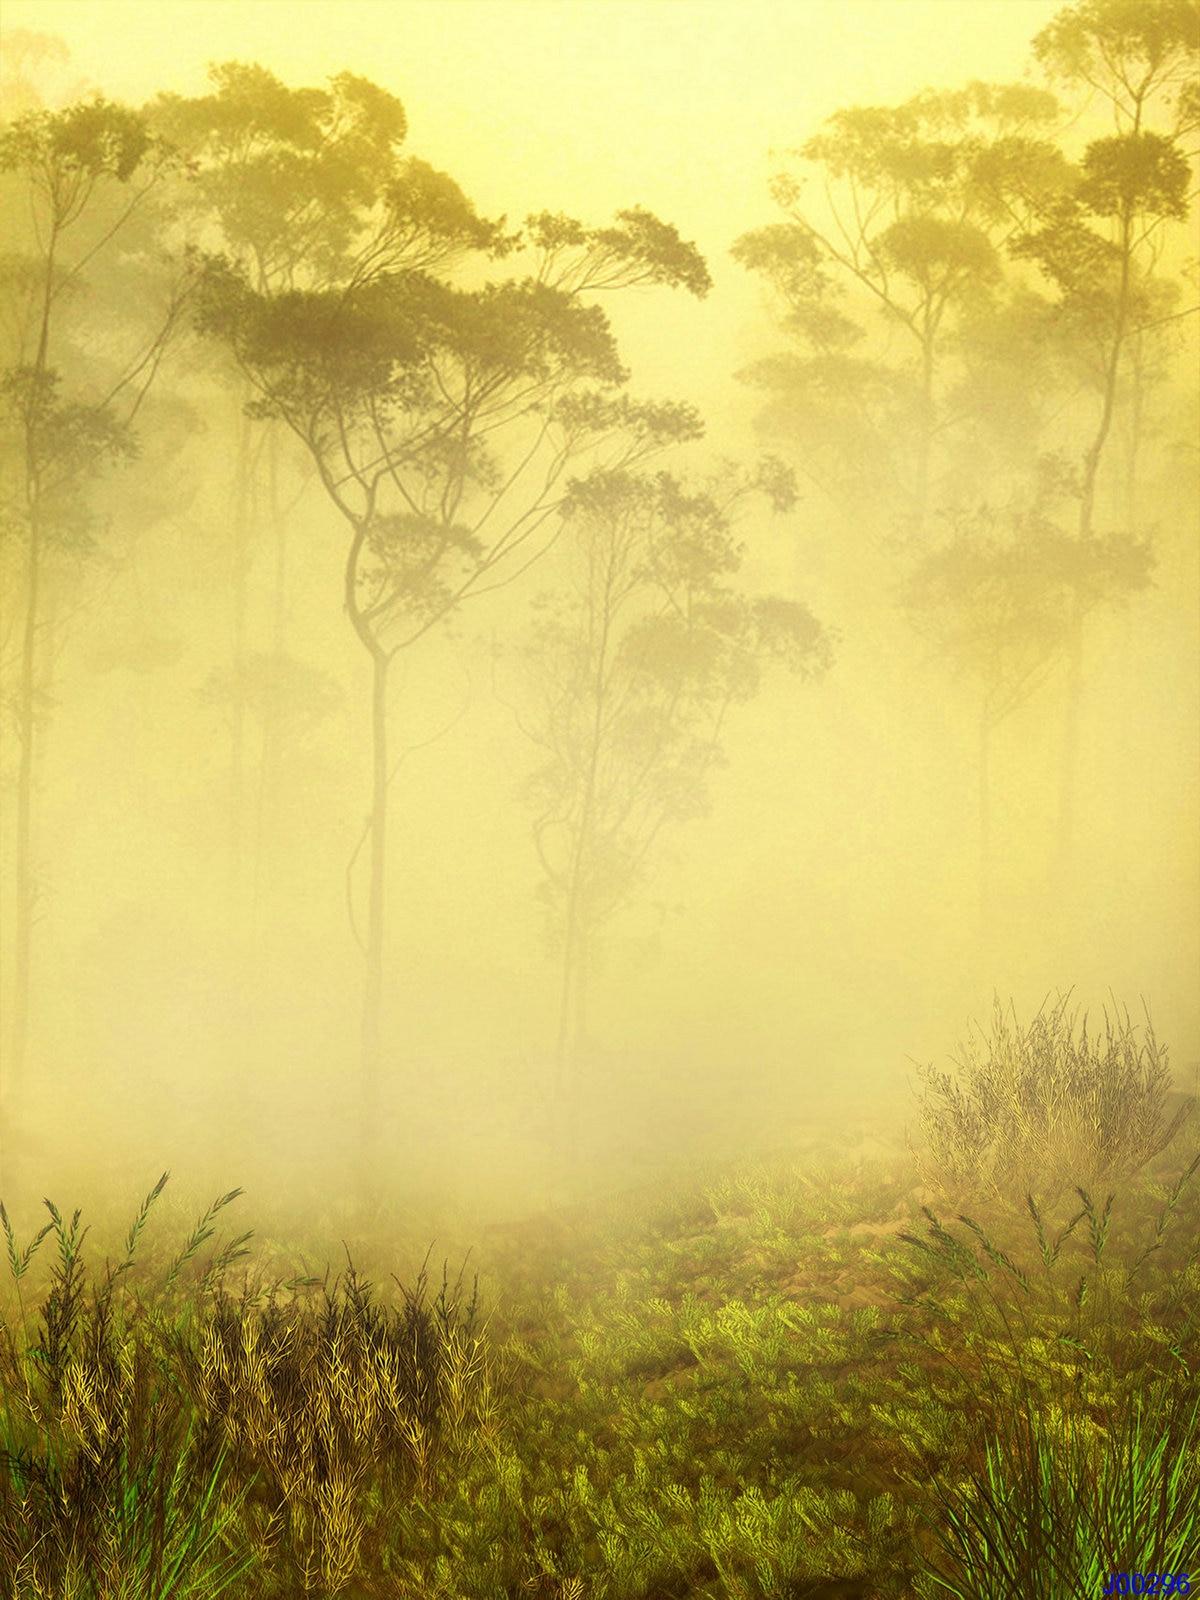 LIFE MAGIC BOX 원더 랜드 150x200cm 인기있는 배경 화면 아름다운 사진 배경 숲 사진 배경 J00296